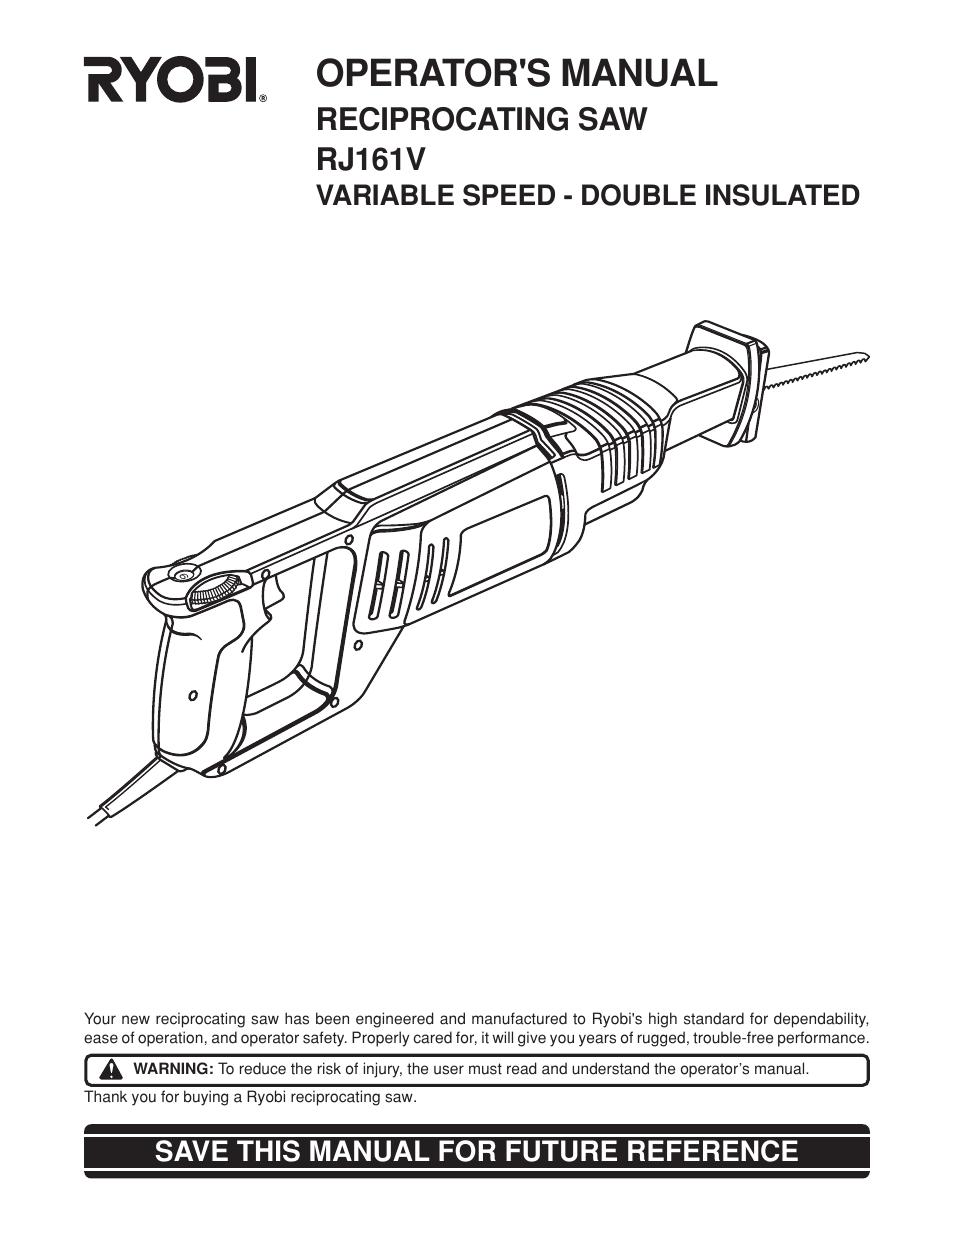 ryobi reciprocating saw manual